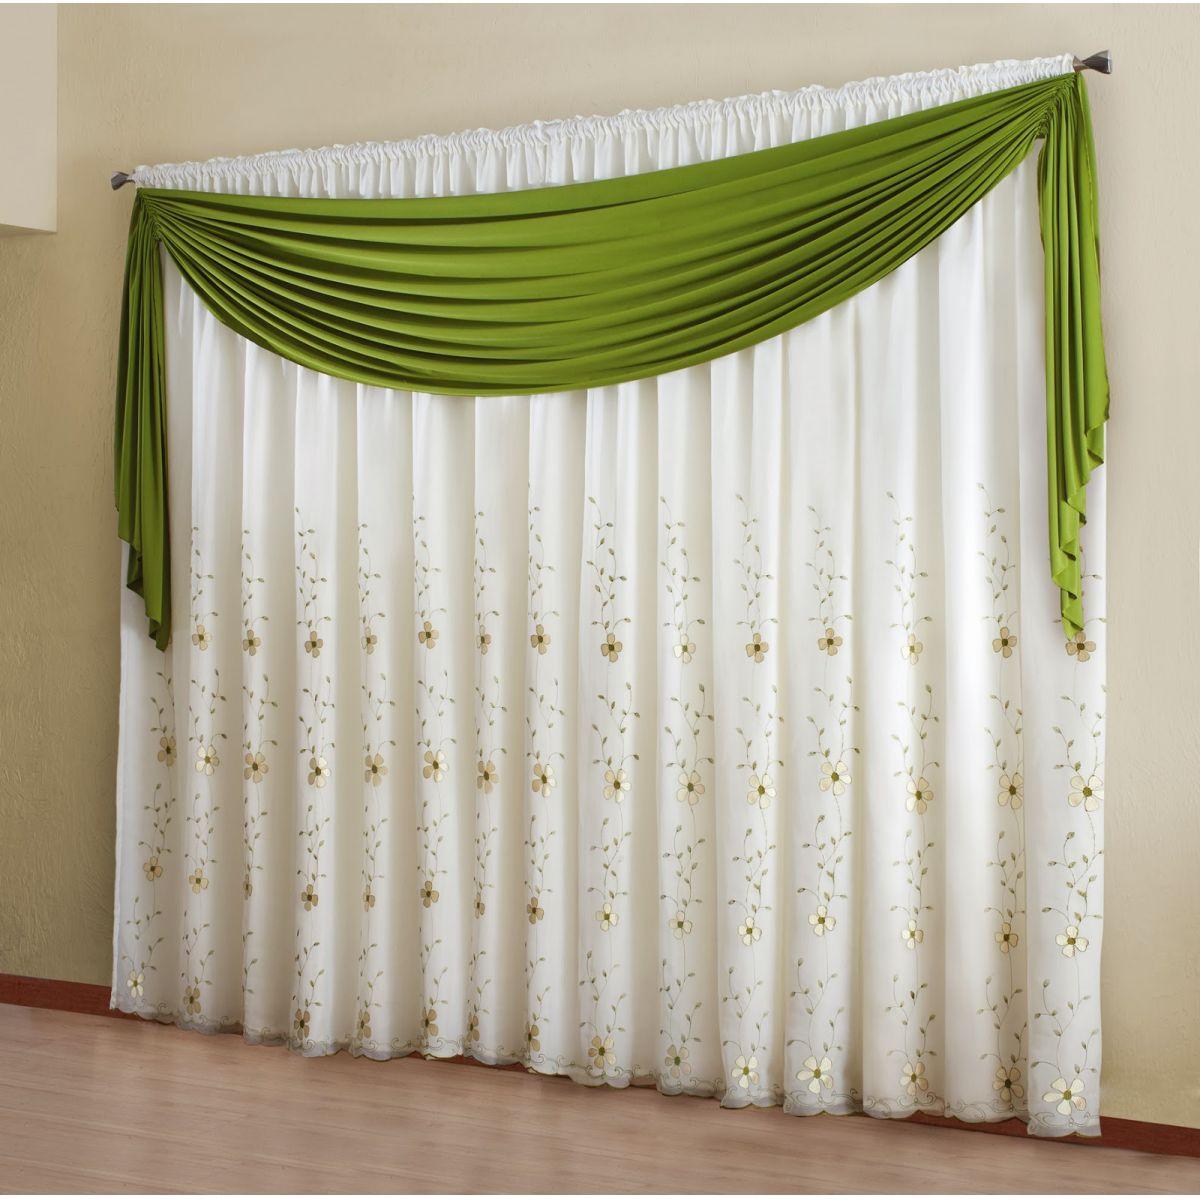 Cortina voal bordado e band 3 00x 2 50 bali verde e for Dormitorio 2 50 x 2 50